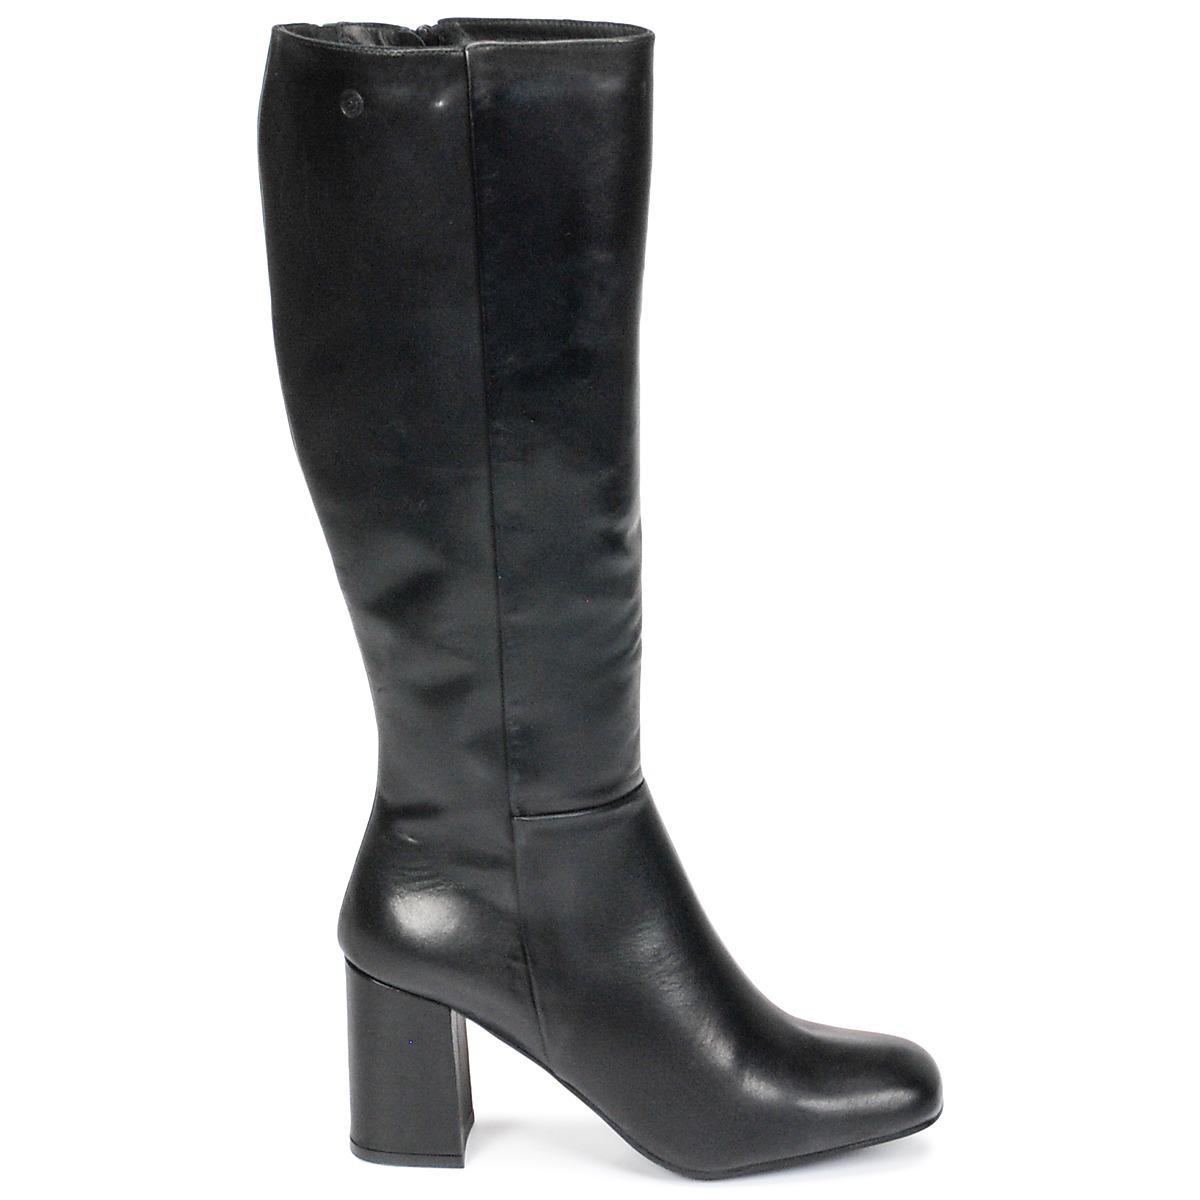 in Jolaju Lyst High Boots Betty Women's London Black Black In F05nwanq